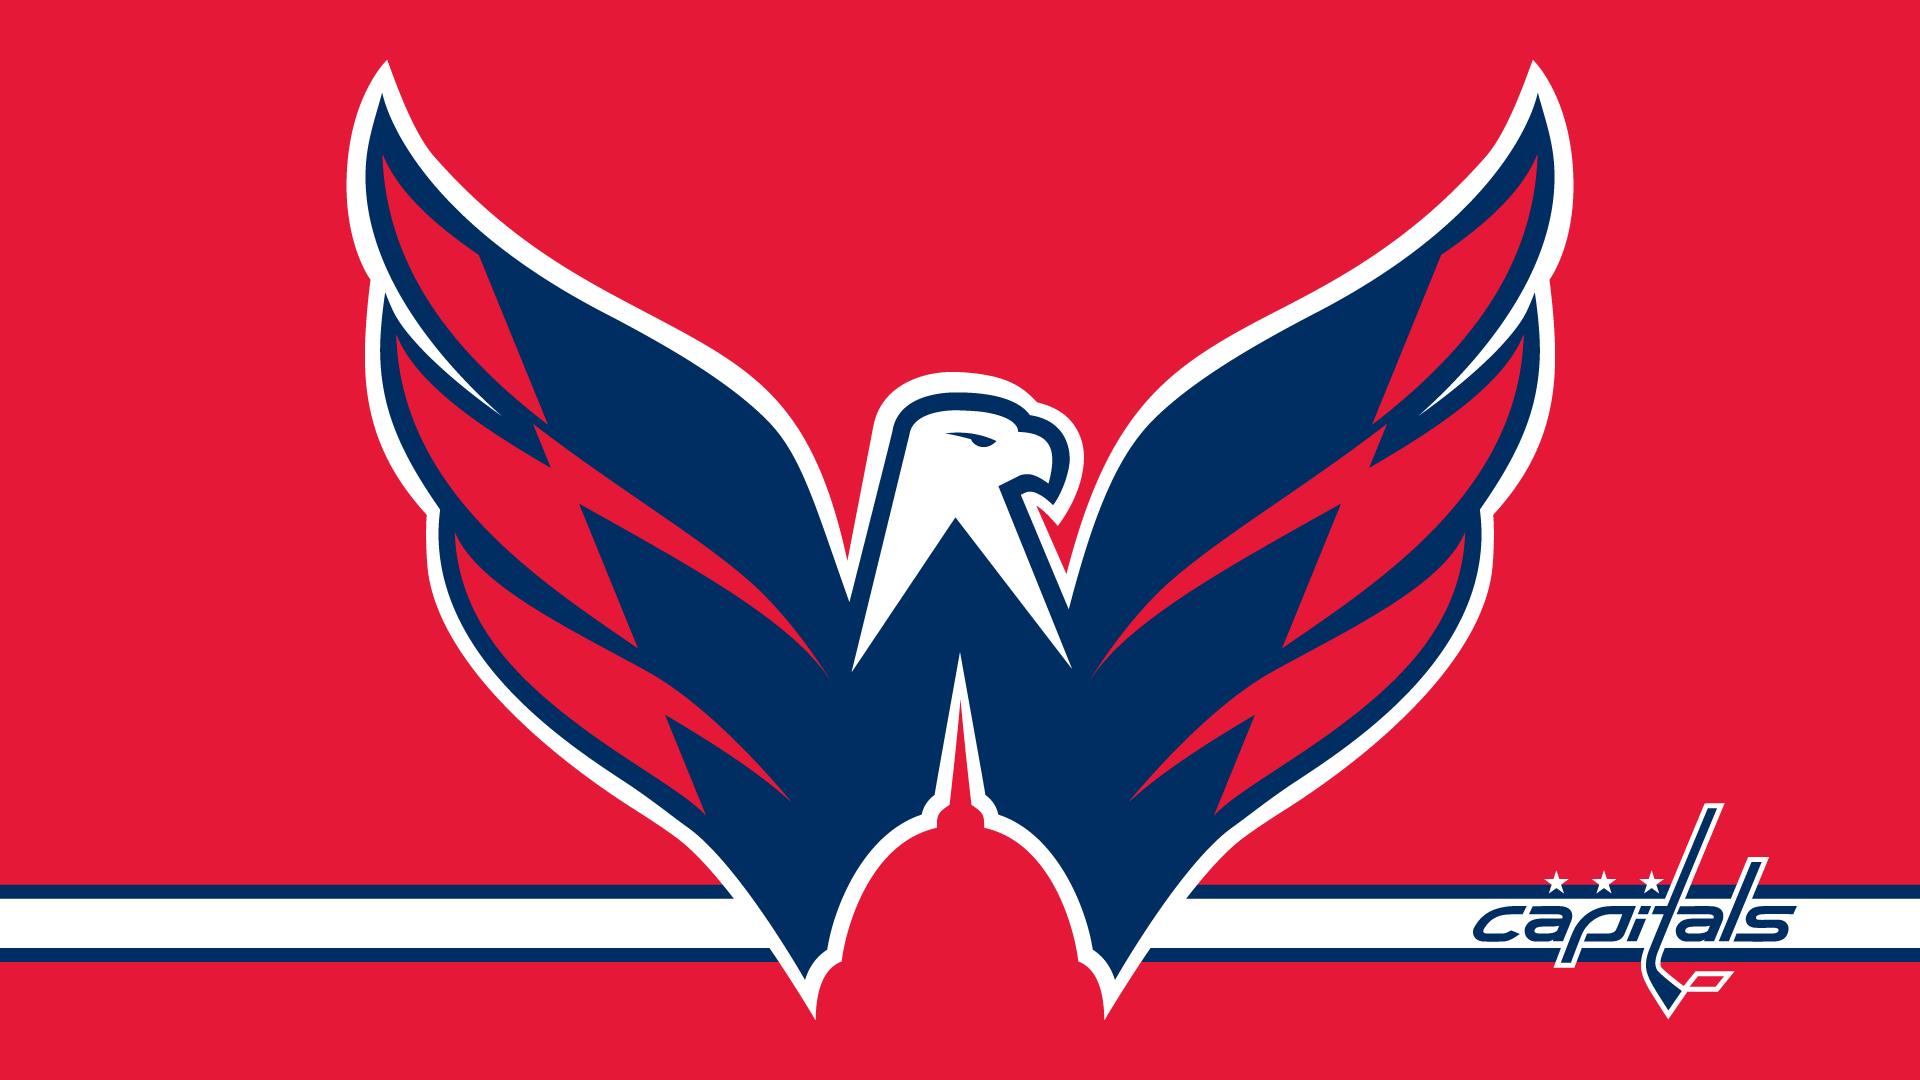 Simple Washington Capitals Wallpaper R Wallpapers Washington Capitals Washington Capitals Hockey Washington